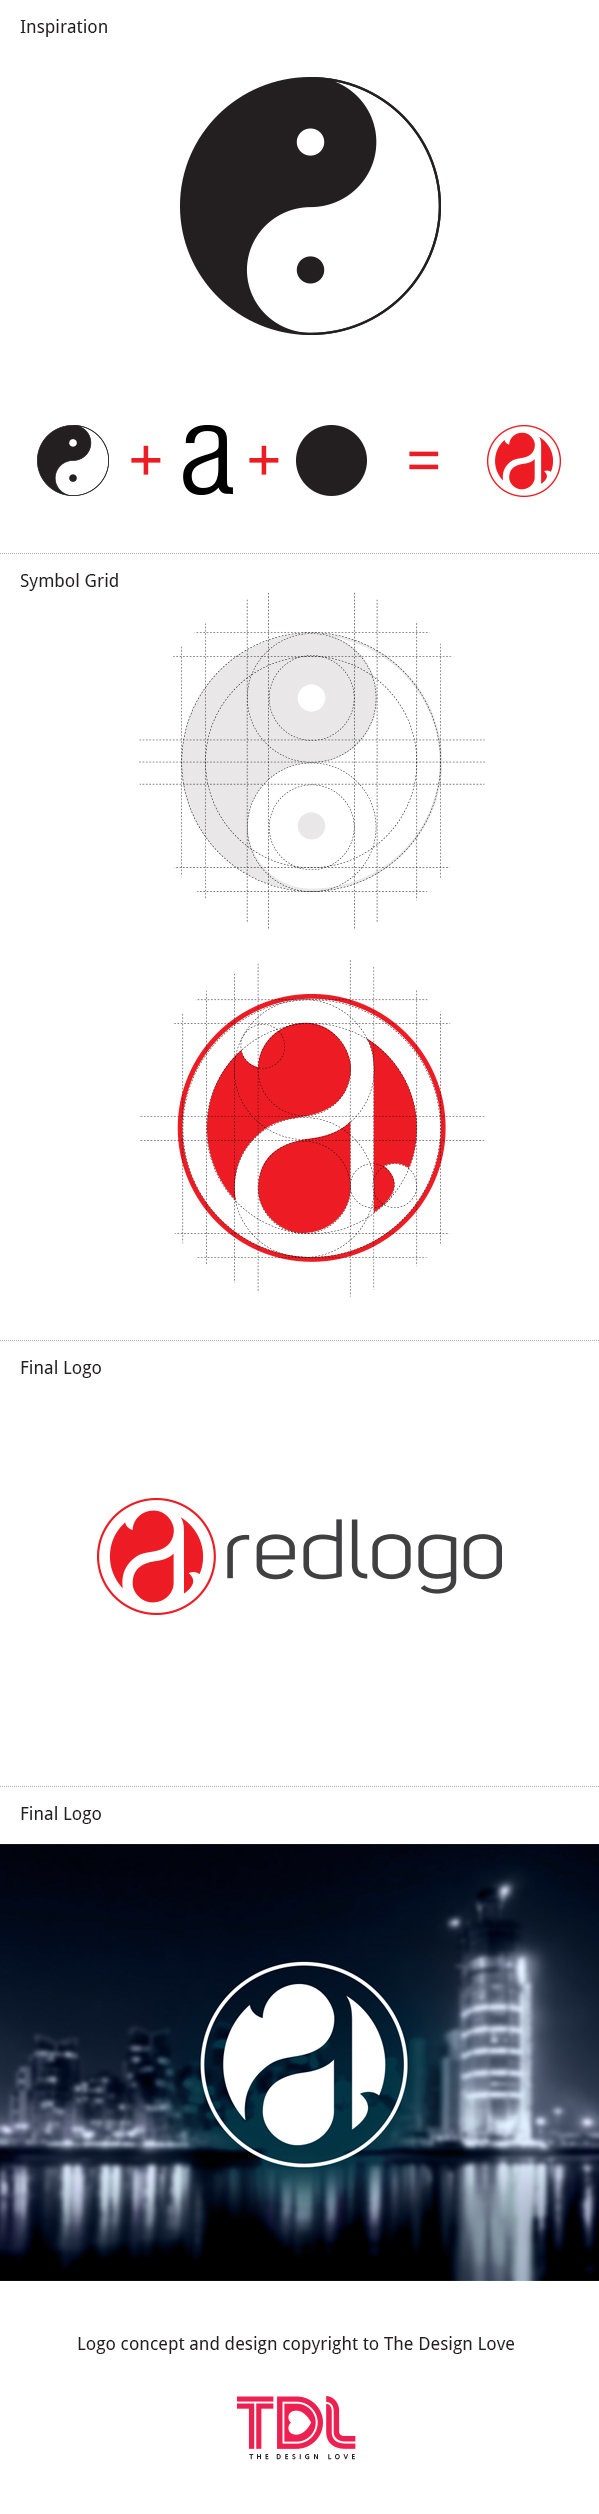 red a logo